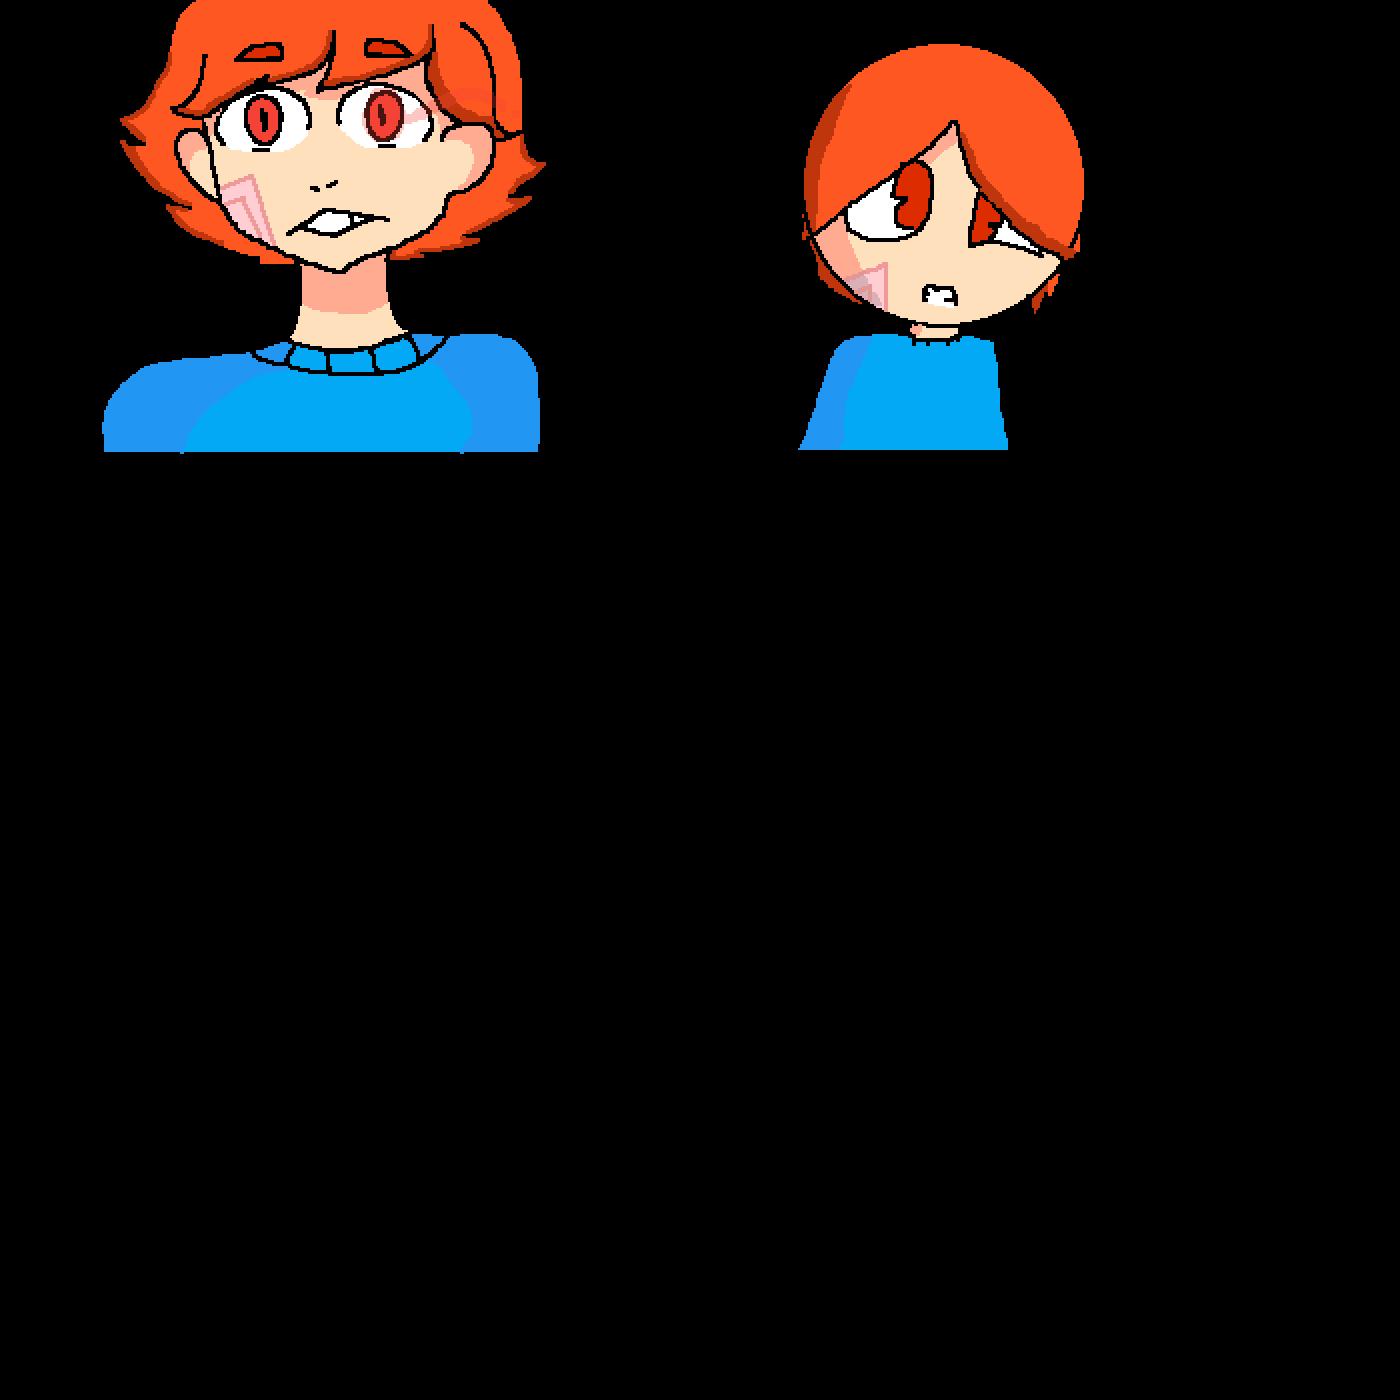 main-image-I was bored OwO  by Cuphead-UwU